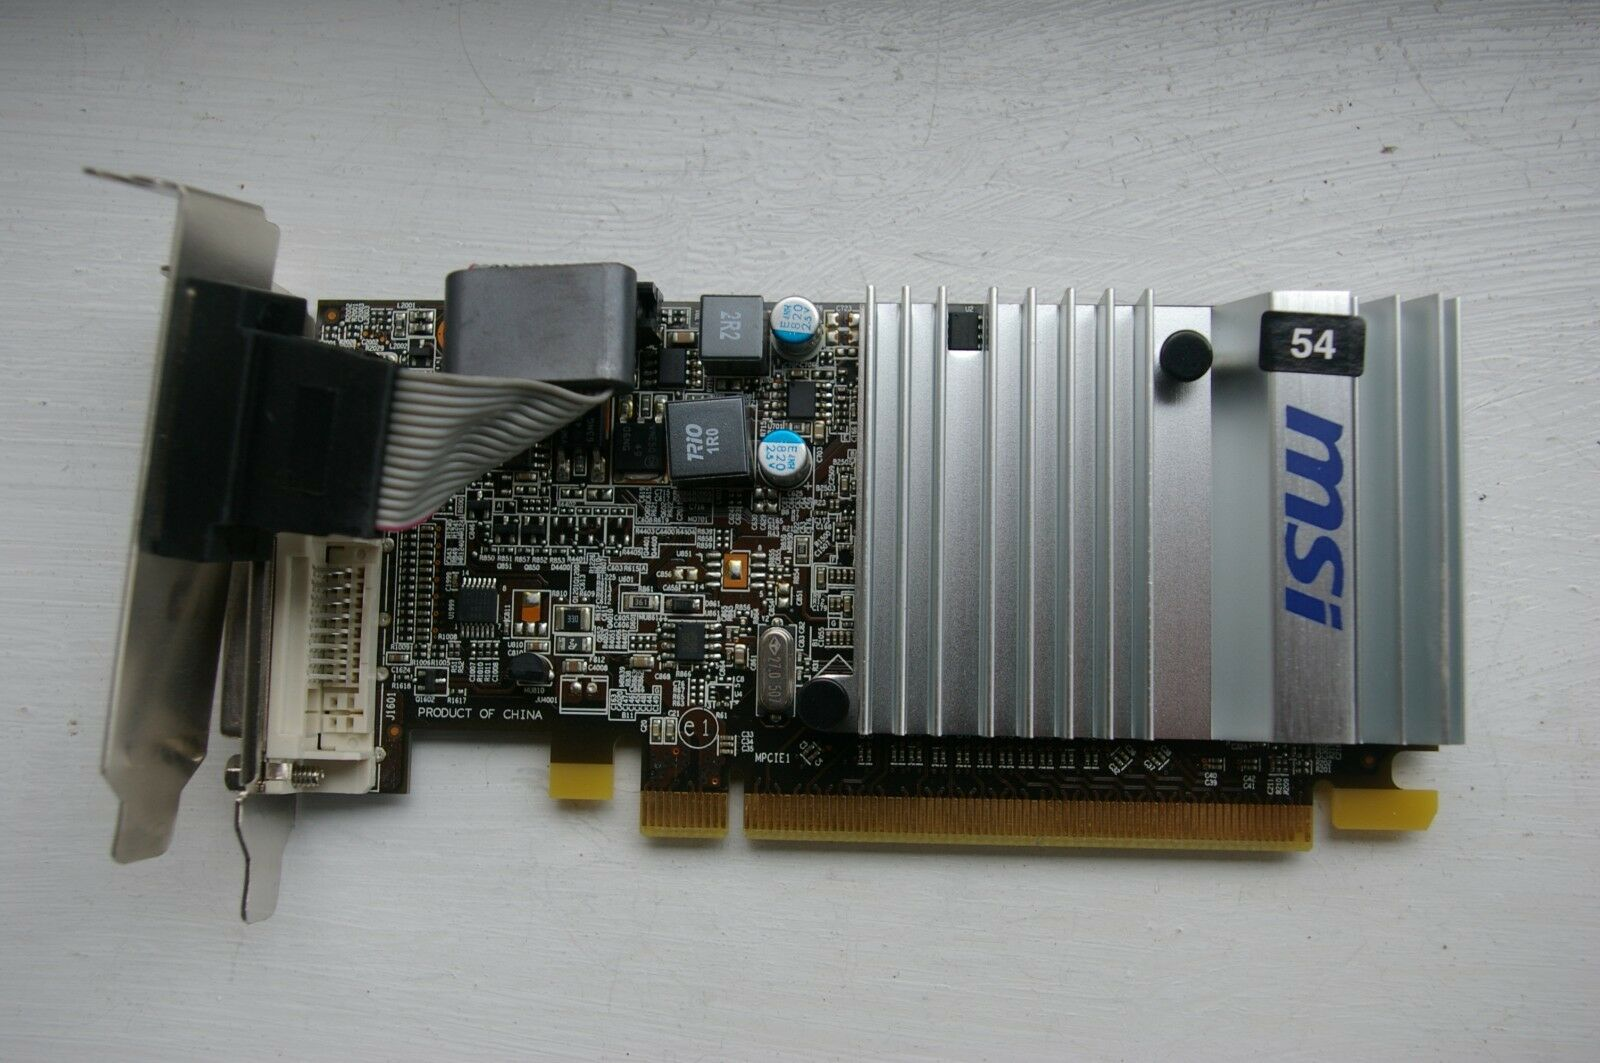 MSI ATI AMD RADEON HD5450 CEDAR 1GB RAM PCI-EX16 HDMI/DVI/VGA